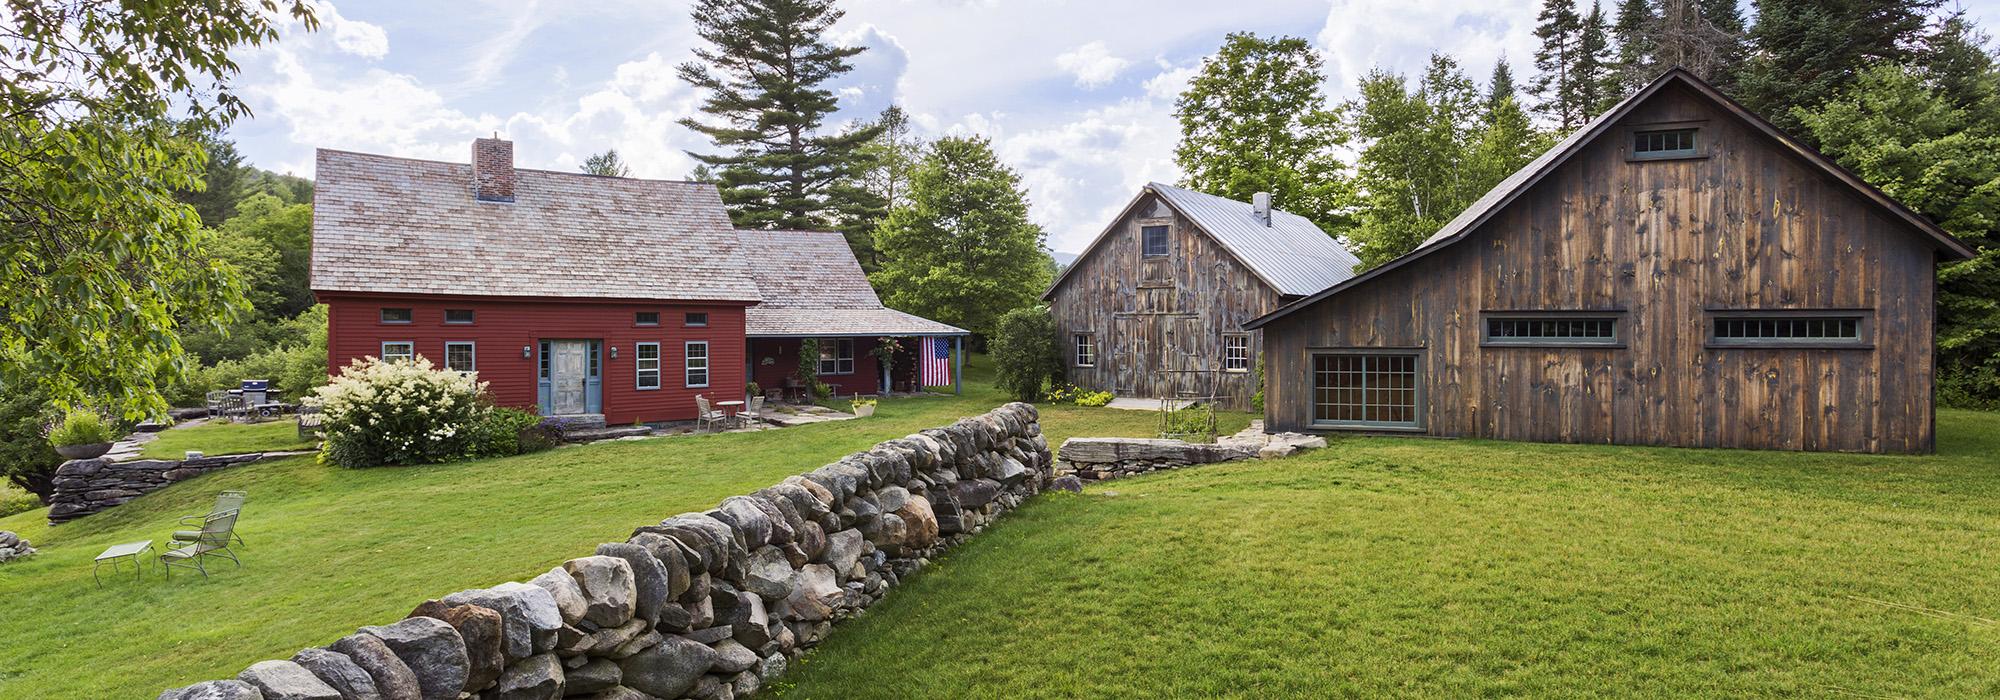 RobinKey_hero_GardenDialogues_Vermont.jpg